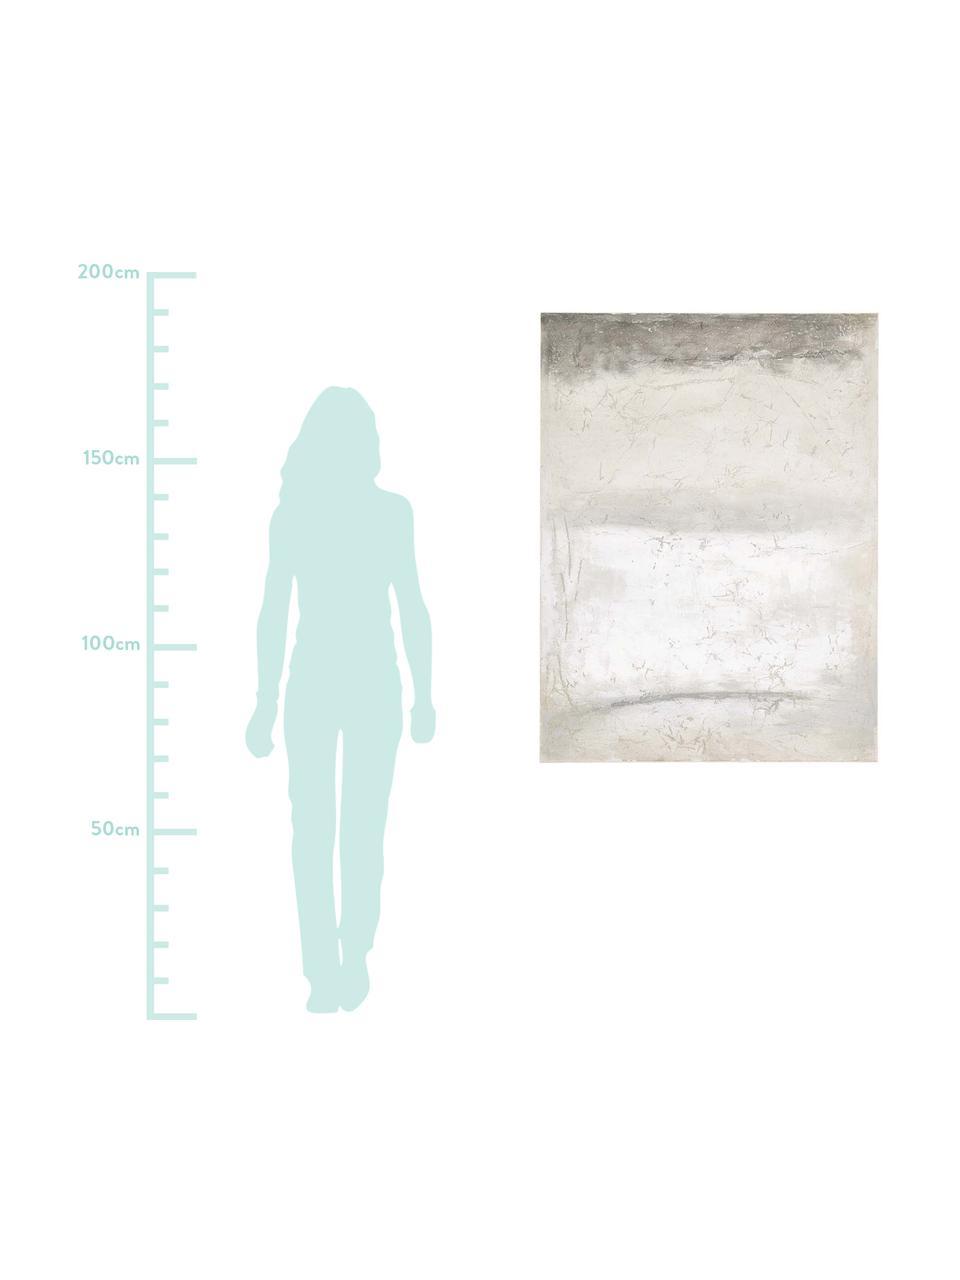 Stampa su tela dipinta a mano Shapes, Immagine: stampa digitale su tela, , Barella: legno, Grigio, Larg. 90 x Alt. 120 cm